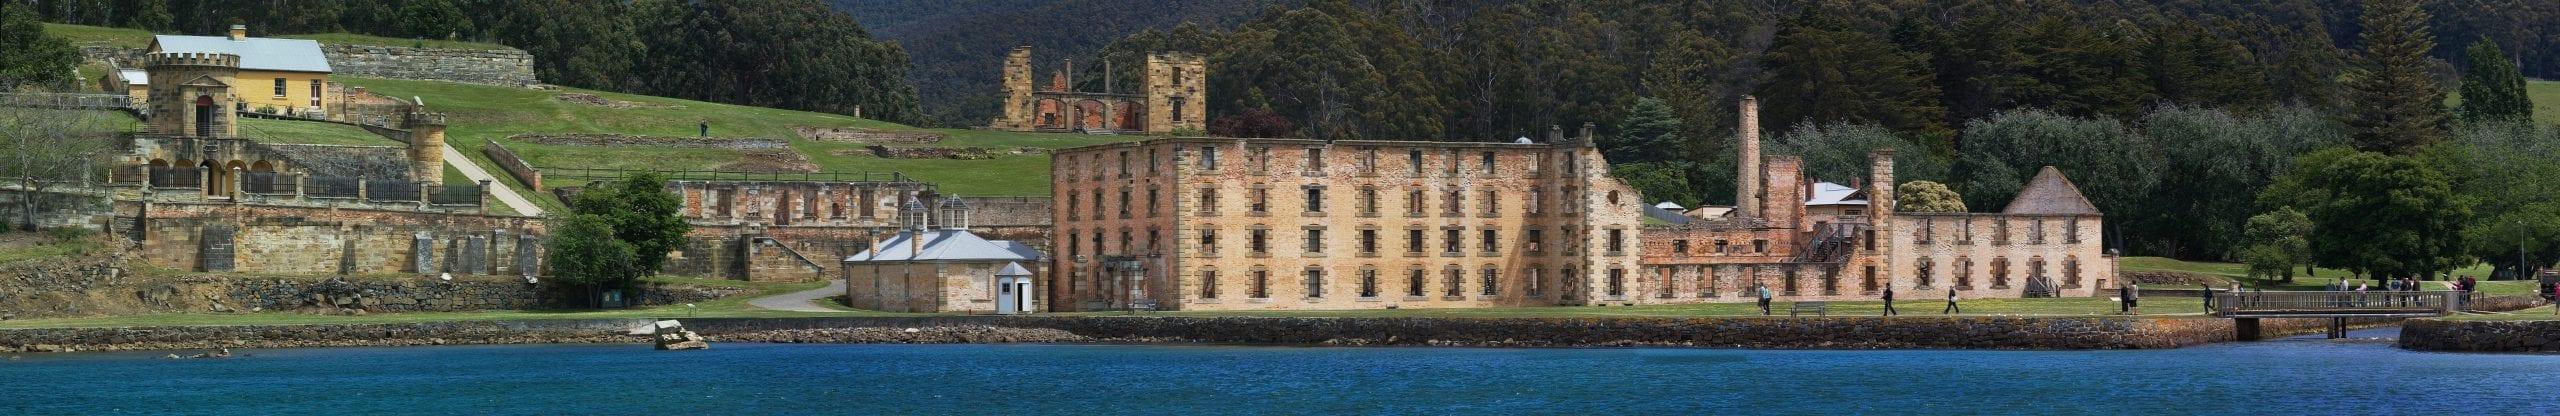 Port Arthur, a world heritage site in Tasmania